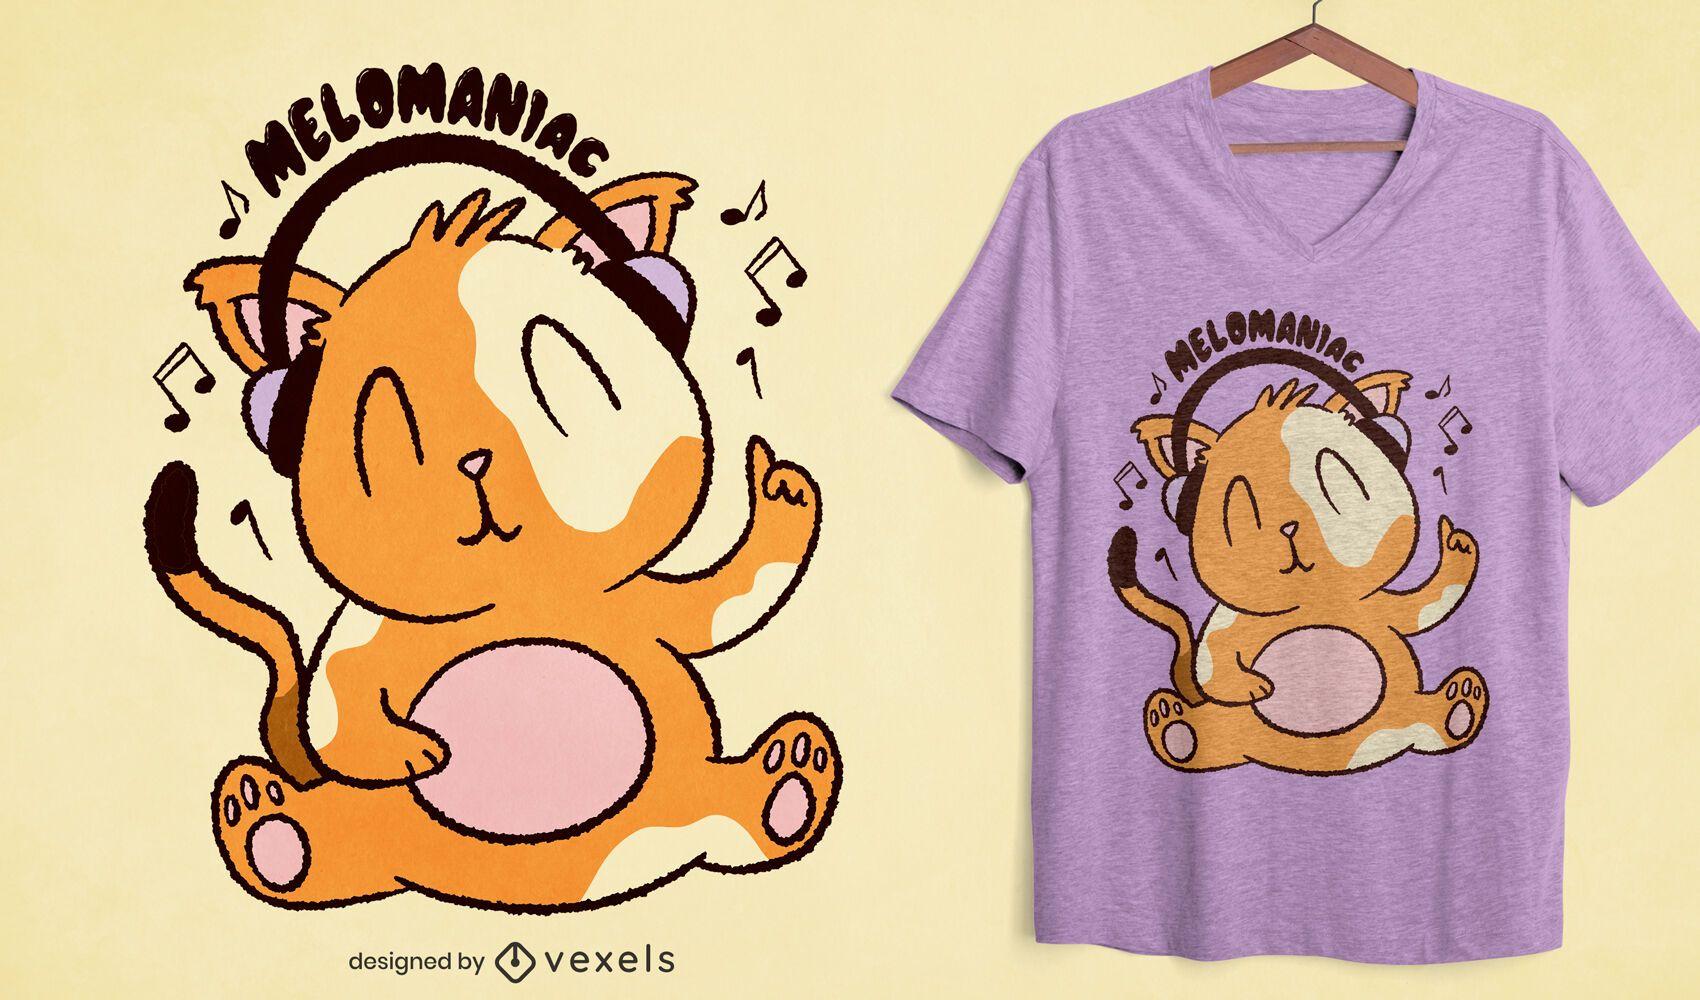 Cat with headphones cartoon t-shirt design